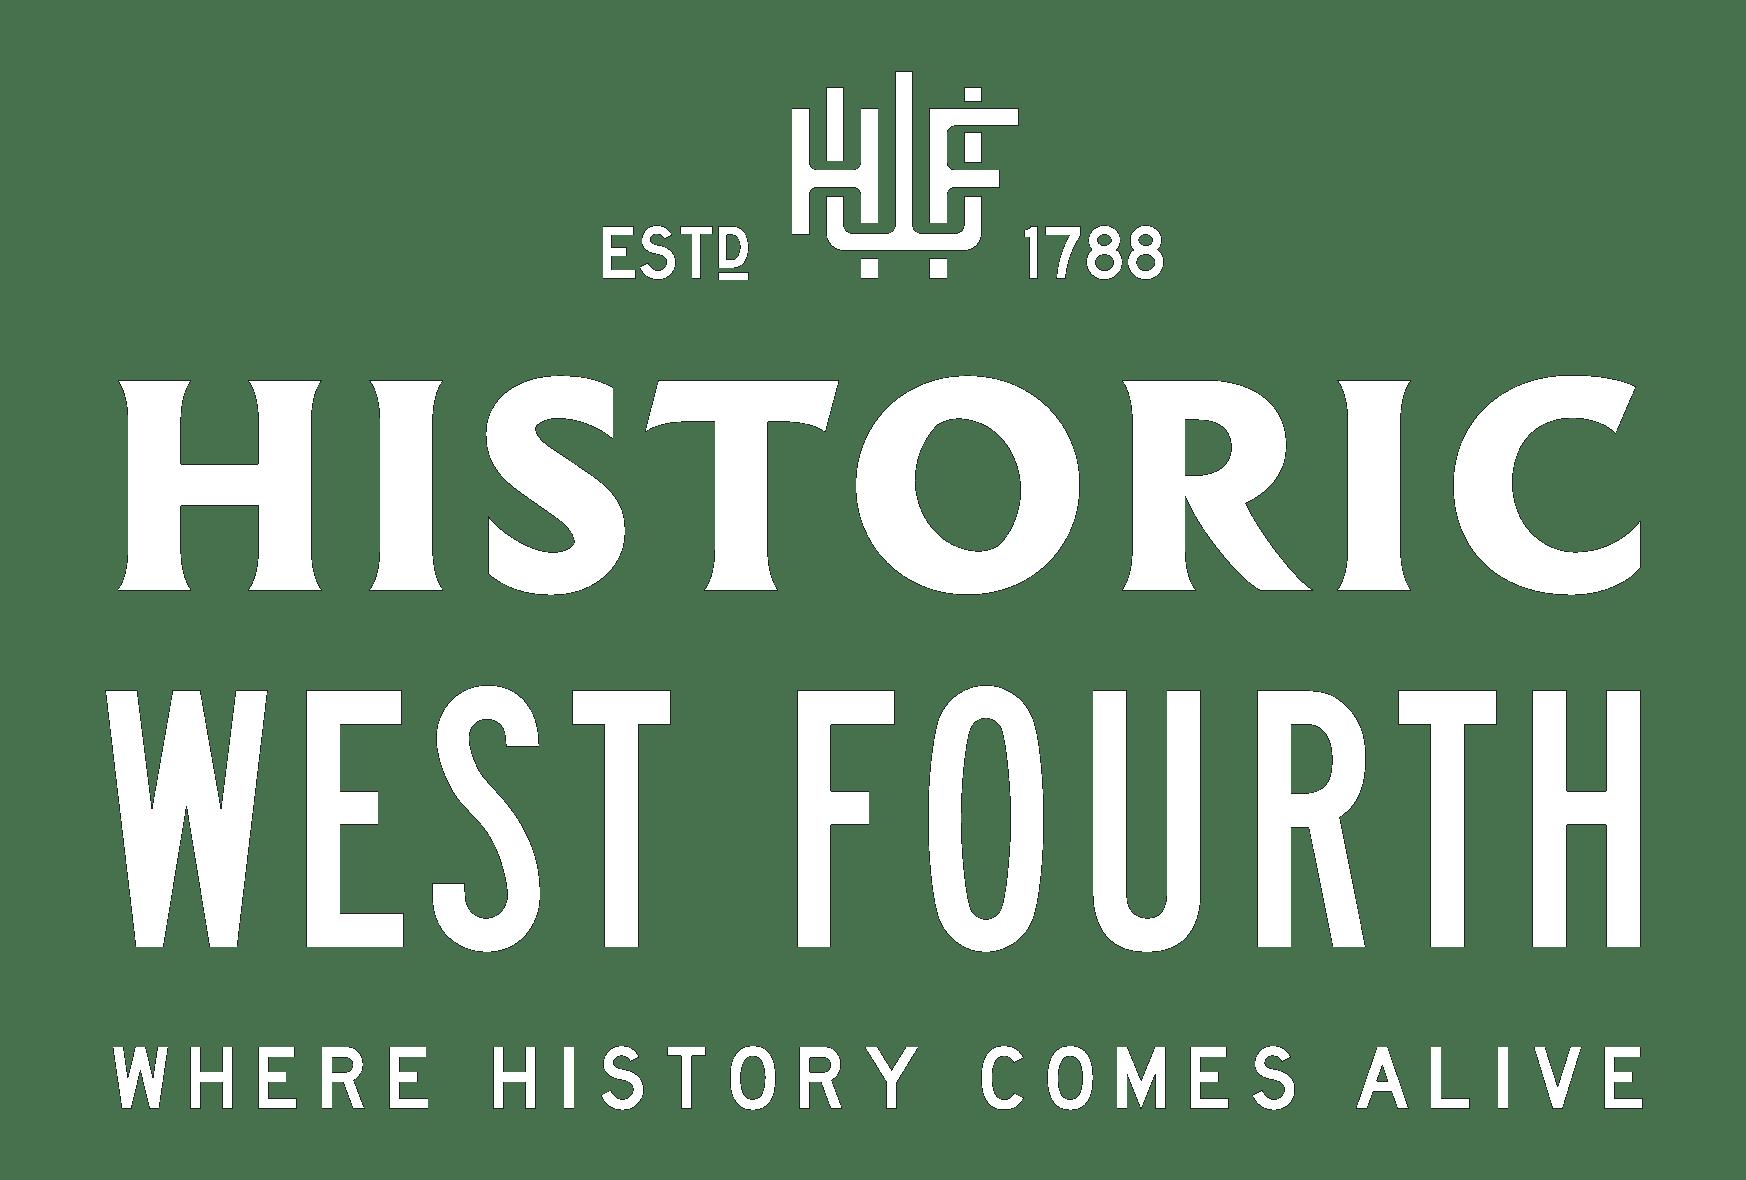 Historic Fourth District Logo